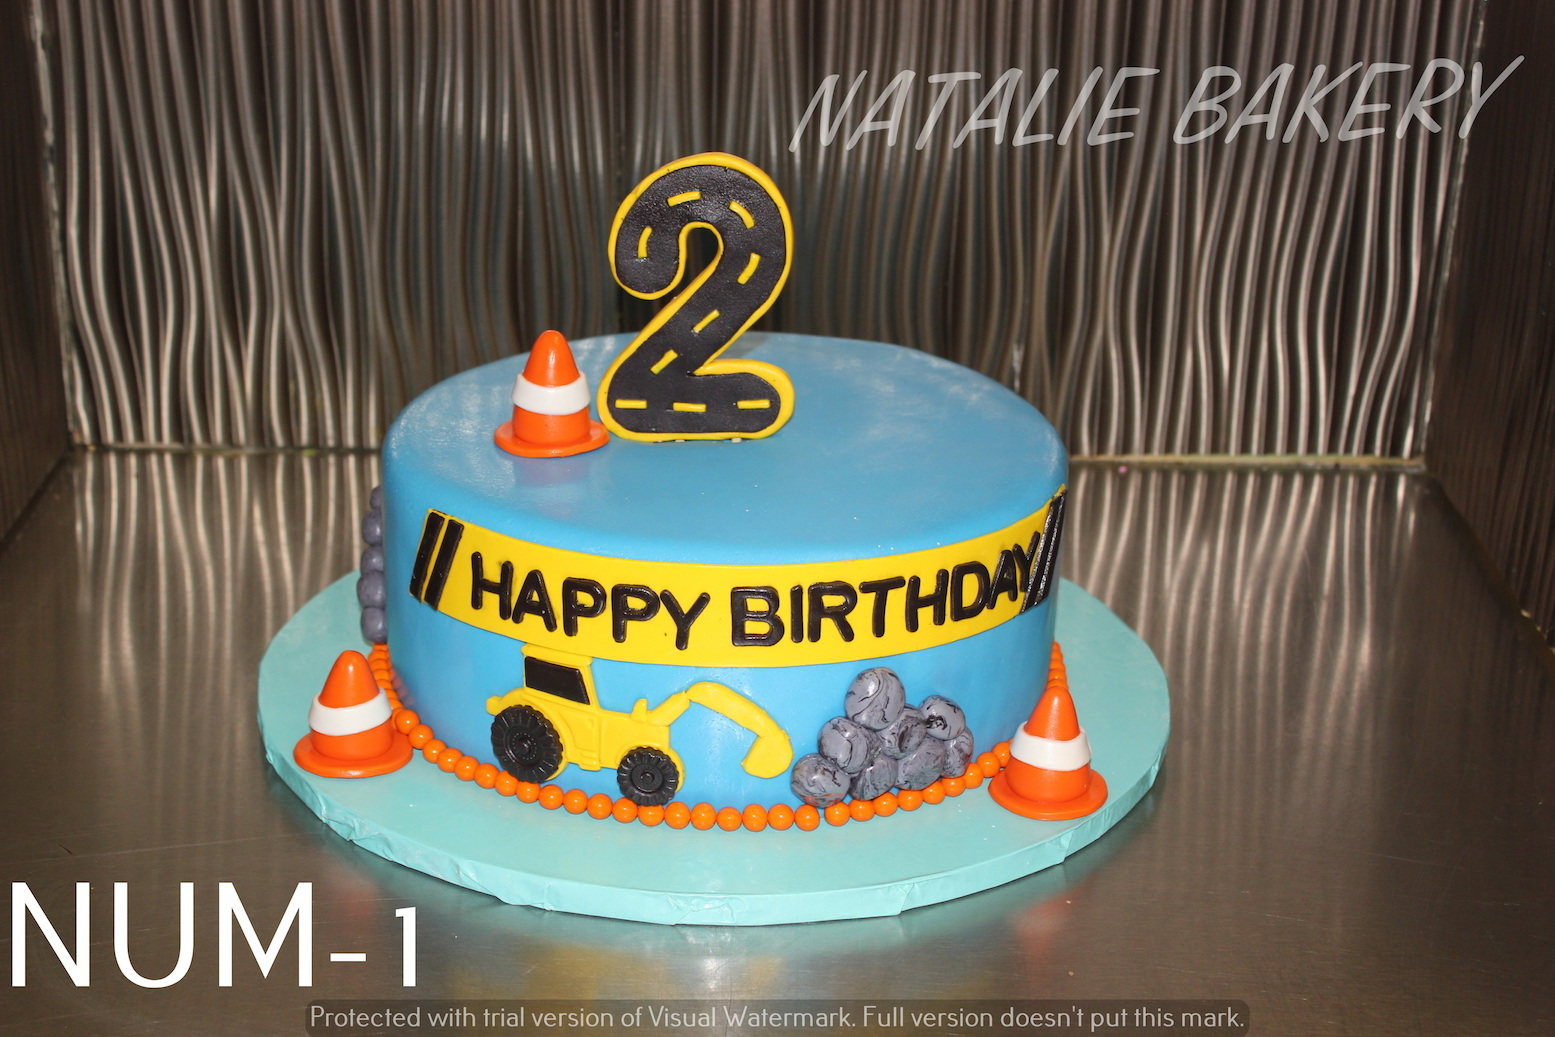 Number Birthday Natalie Bakery